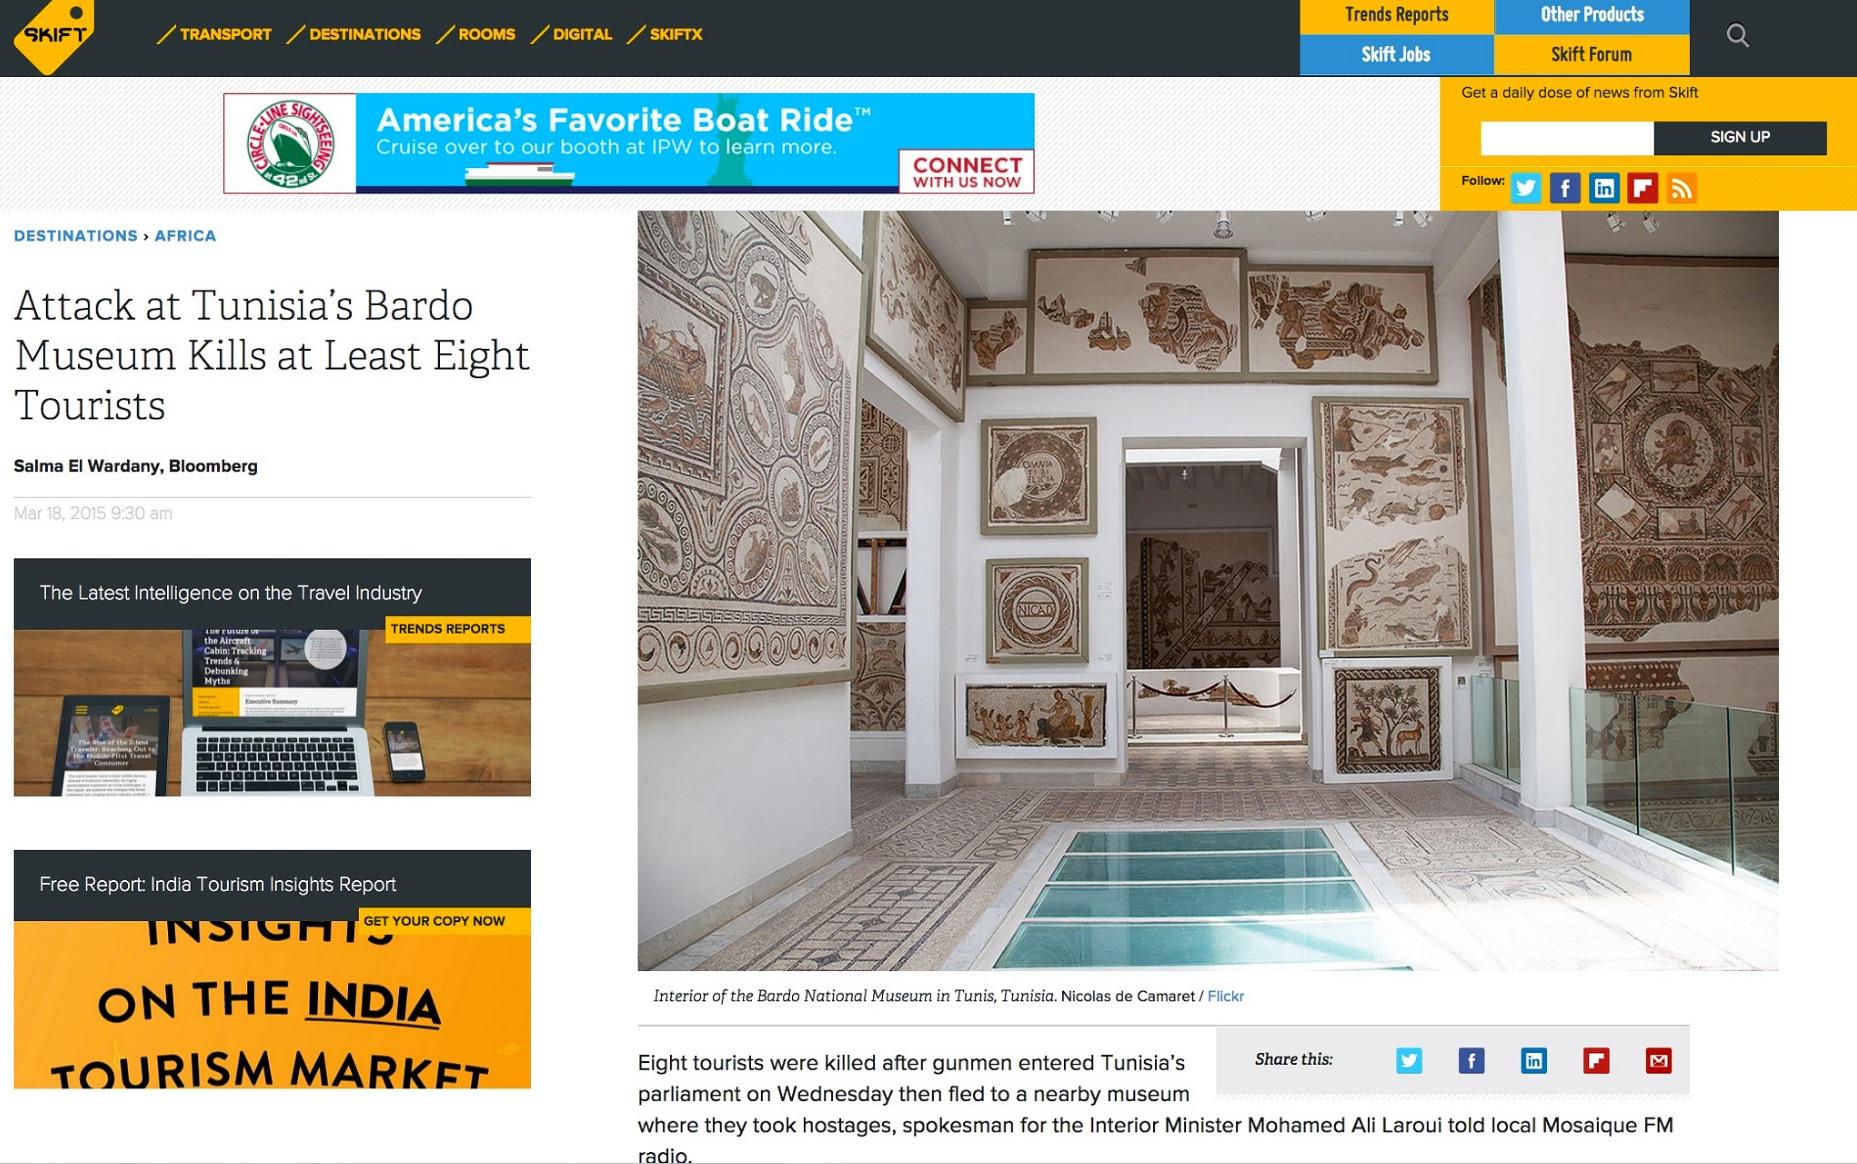 http://skift.com/2015/03/18/attack-at-tunisias-bardo-museum-kills-at-least-eight-tourists/